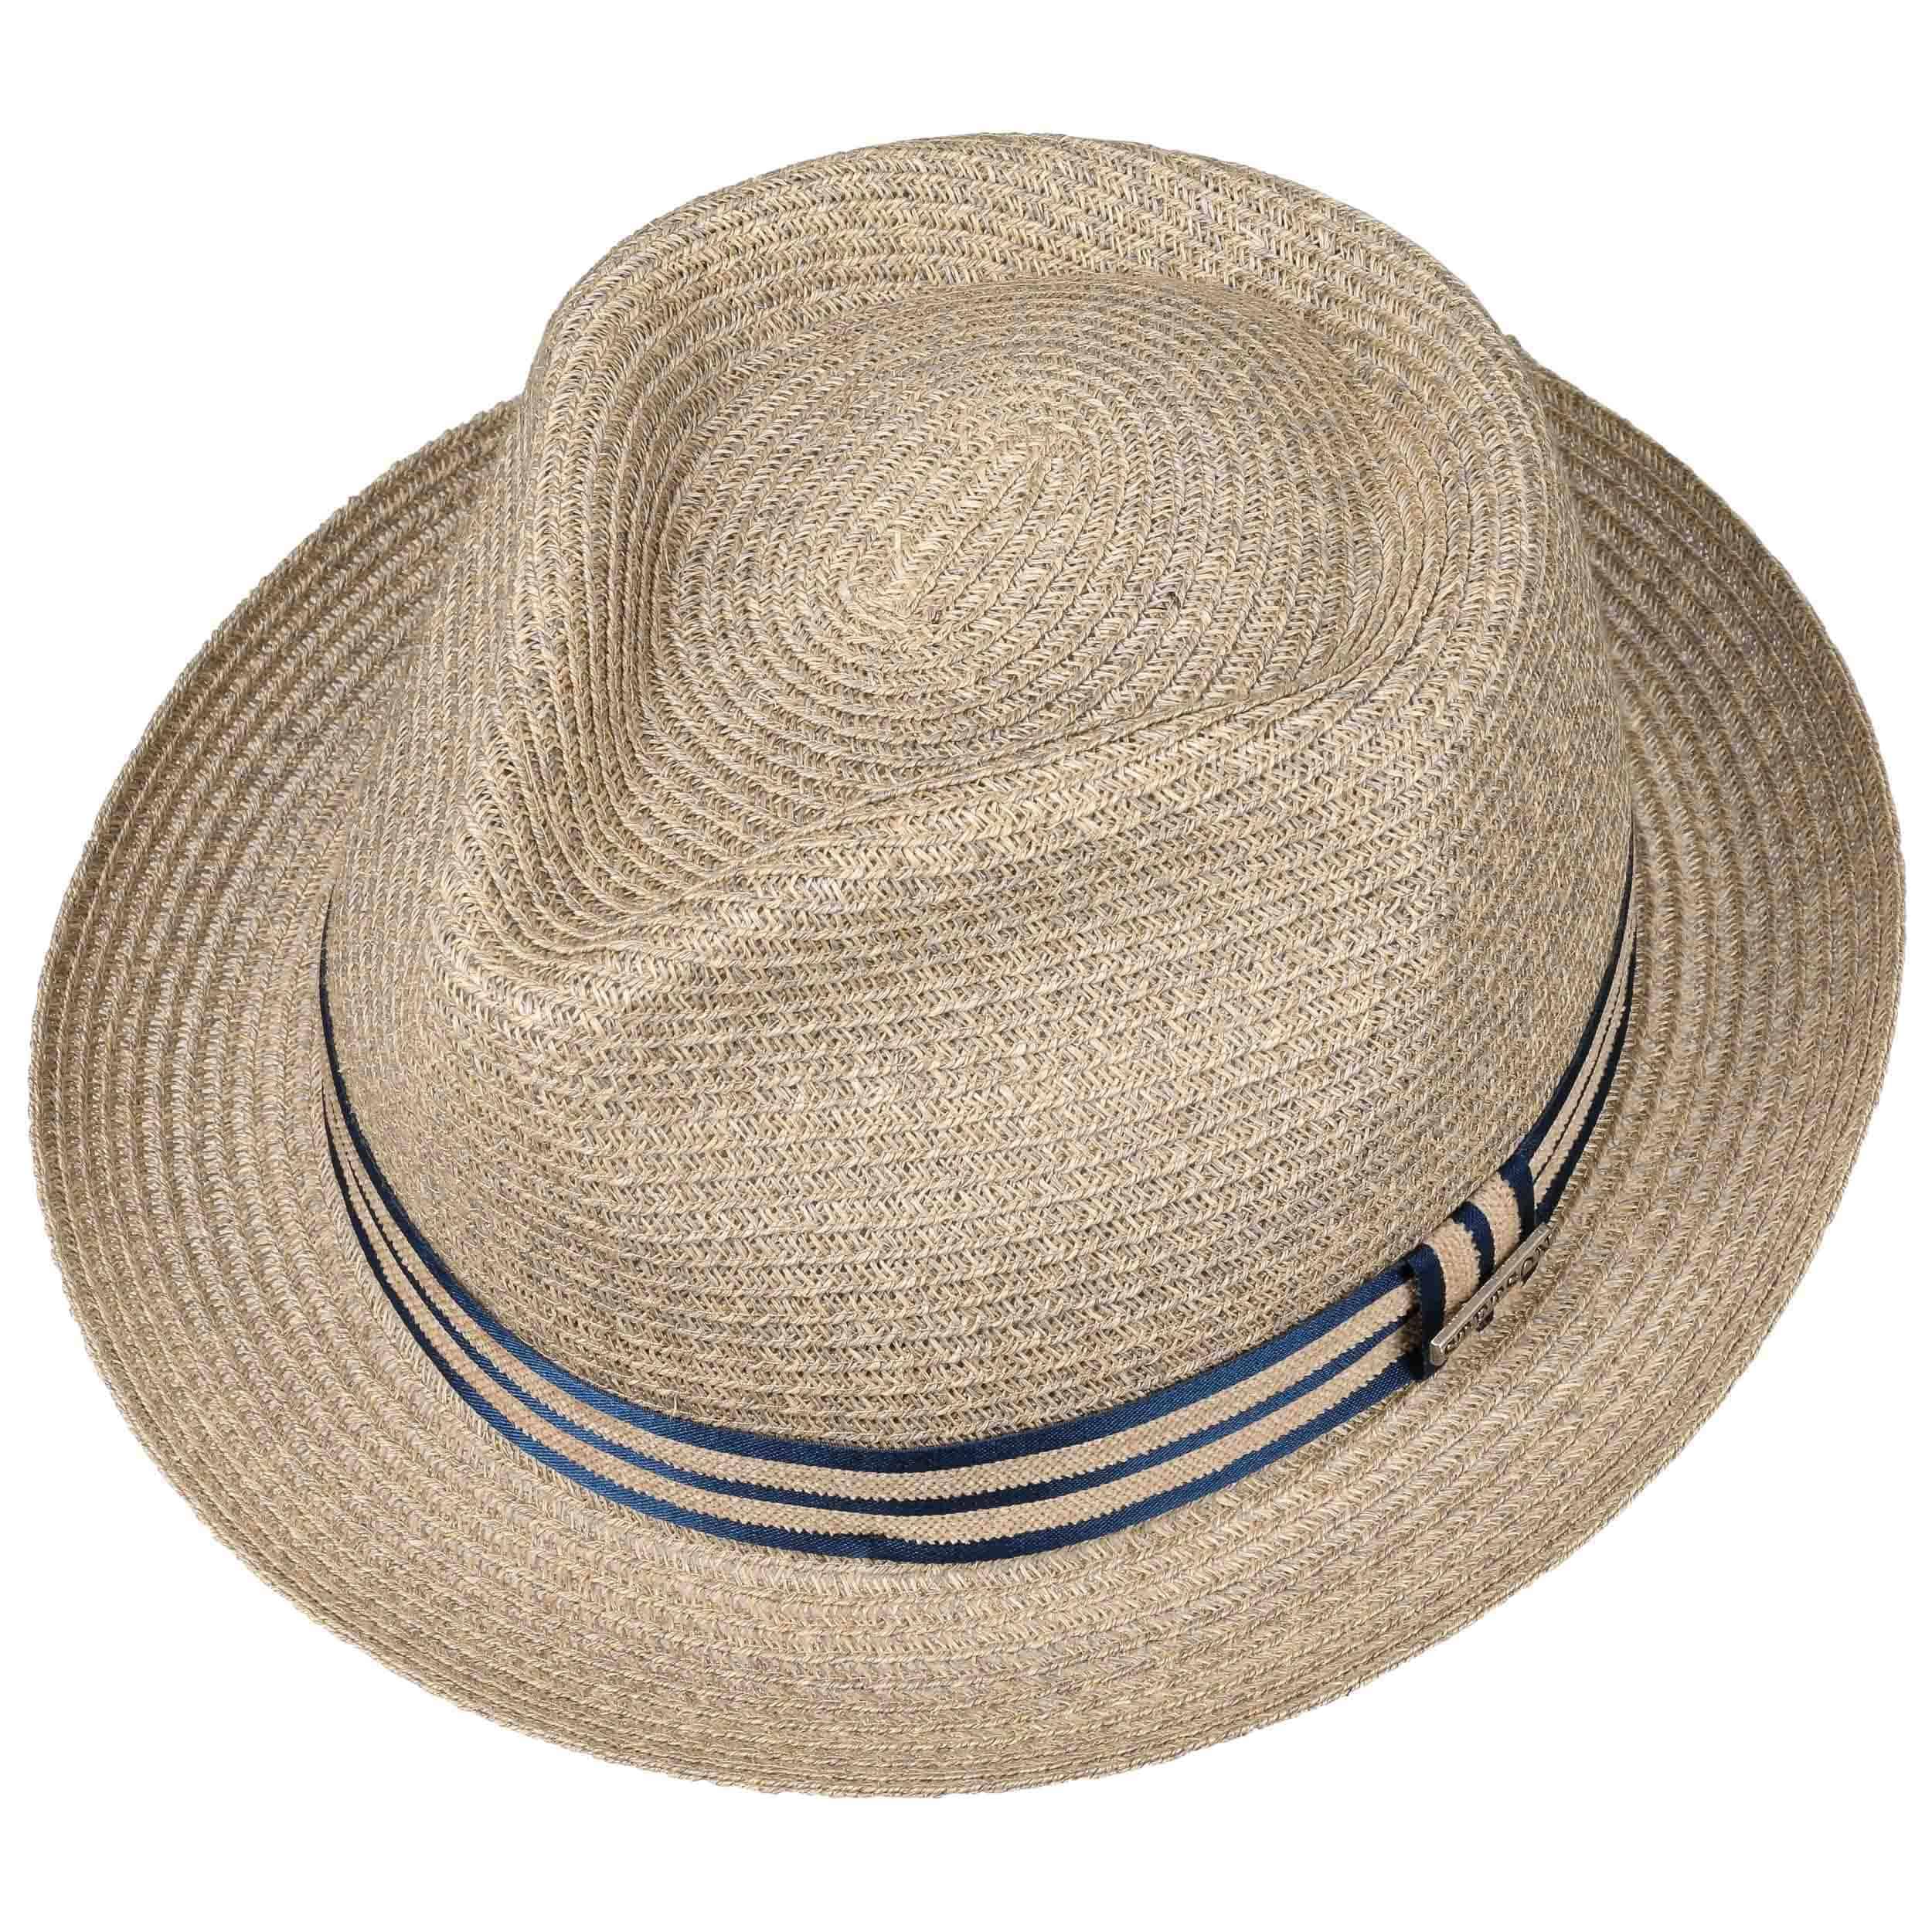 Hemp Player Sun Hat by Stetson - beige 1 ... 029af3b000f